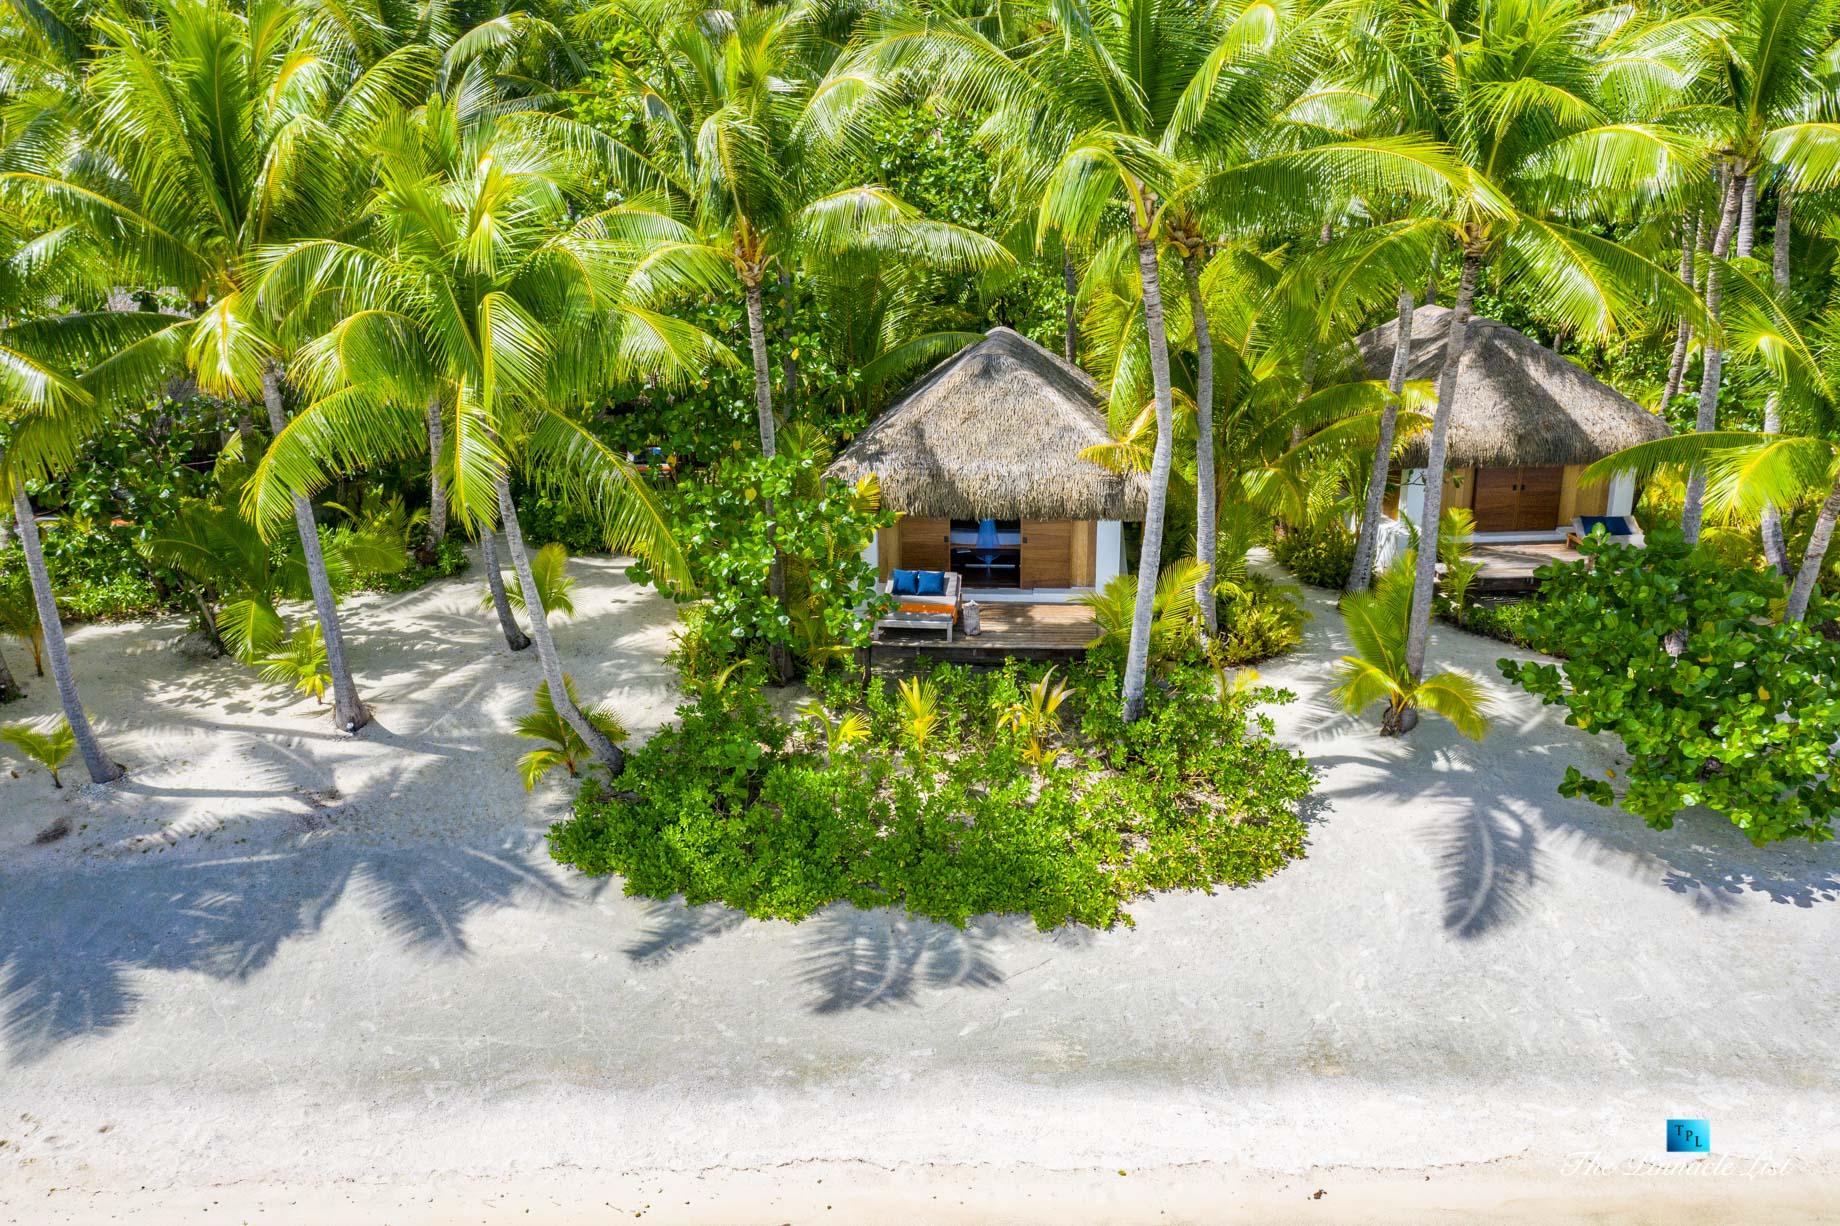 Motu Tane Private Island – Bora Bora, French Polynesia